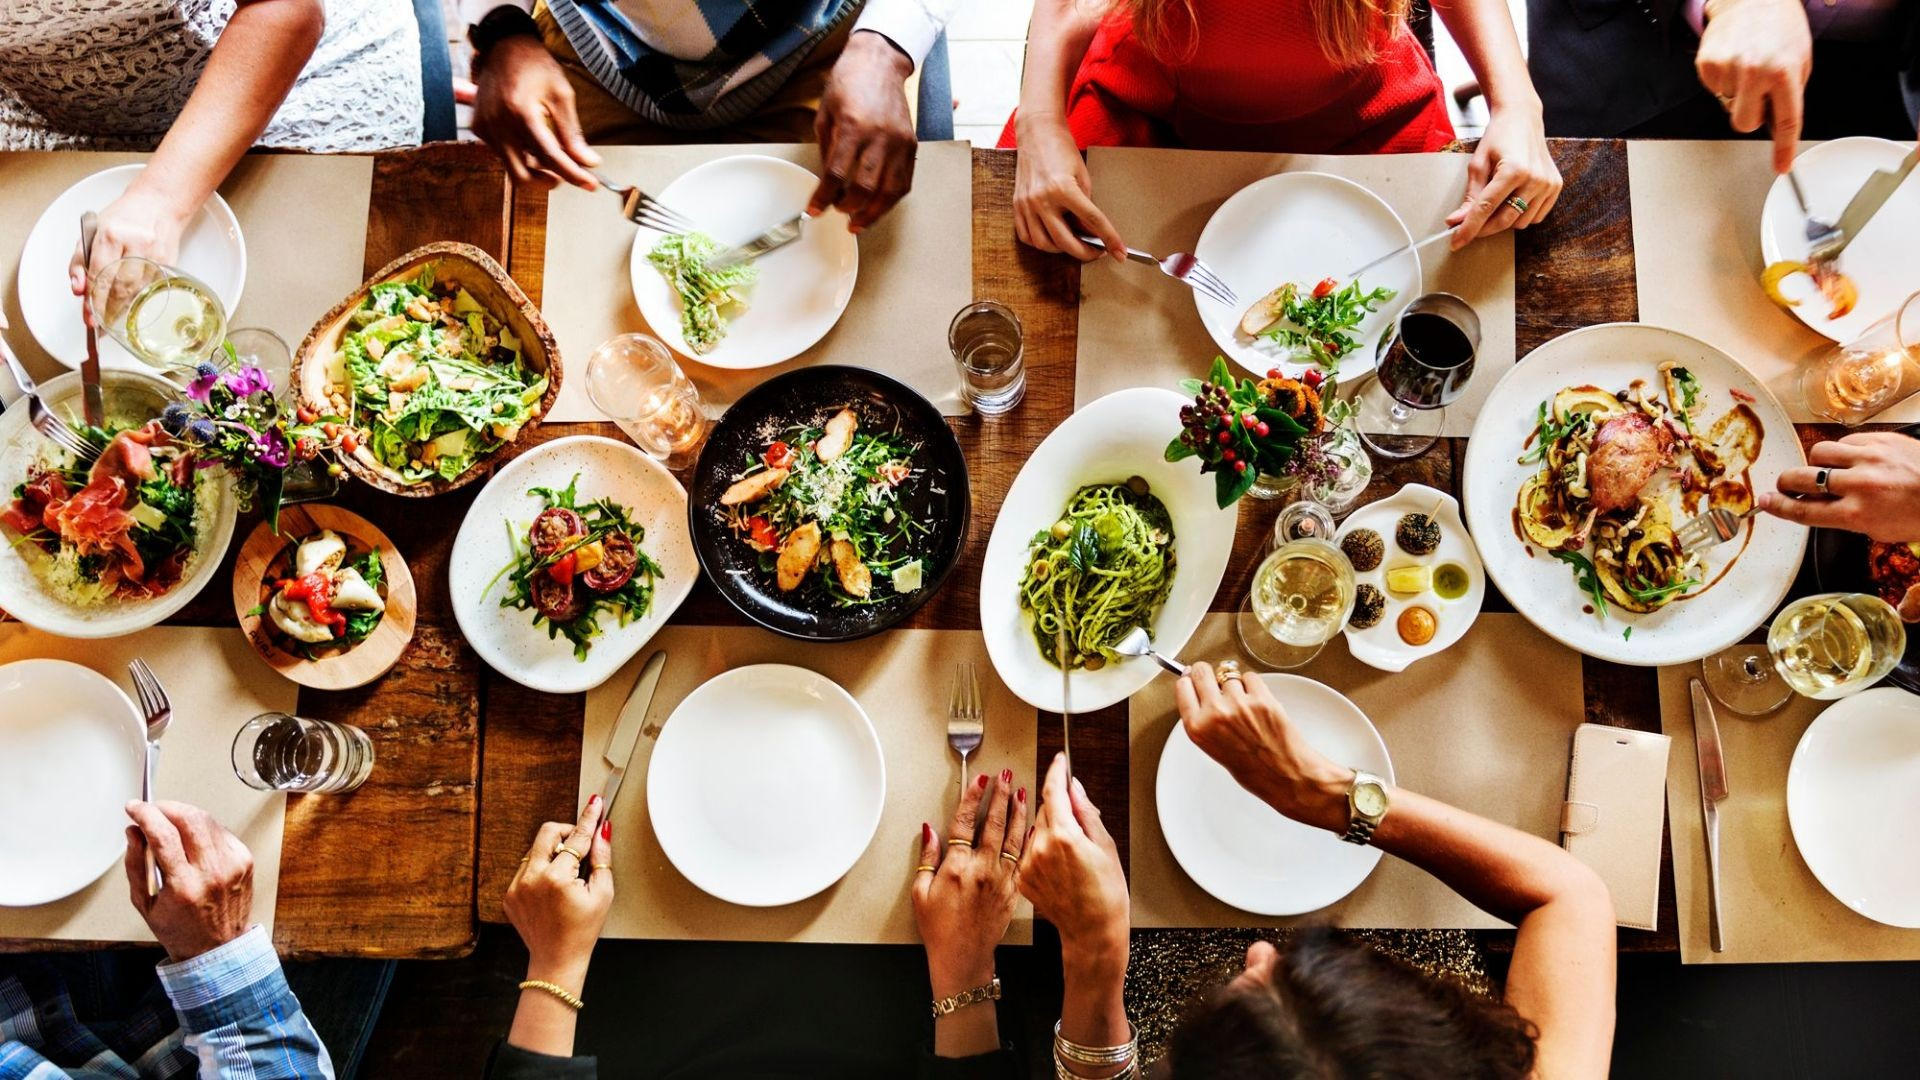 000-comida-restaurante-cena-grupo-amigos-empresa